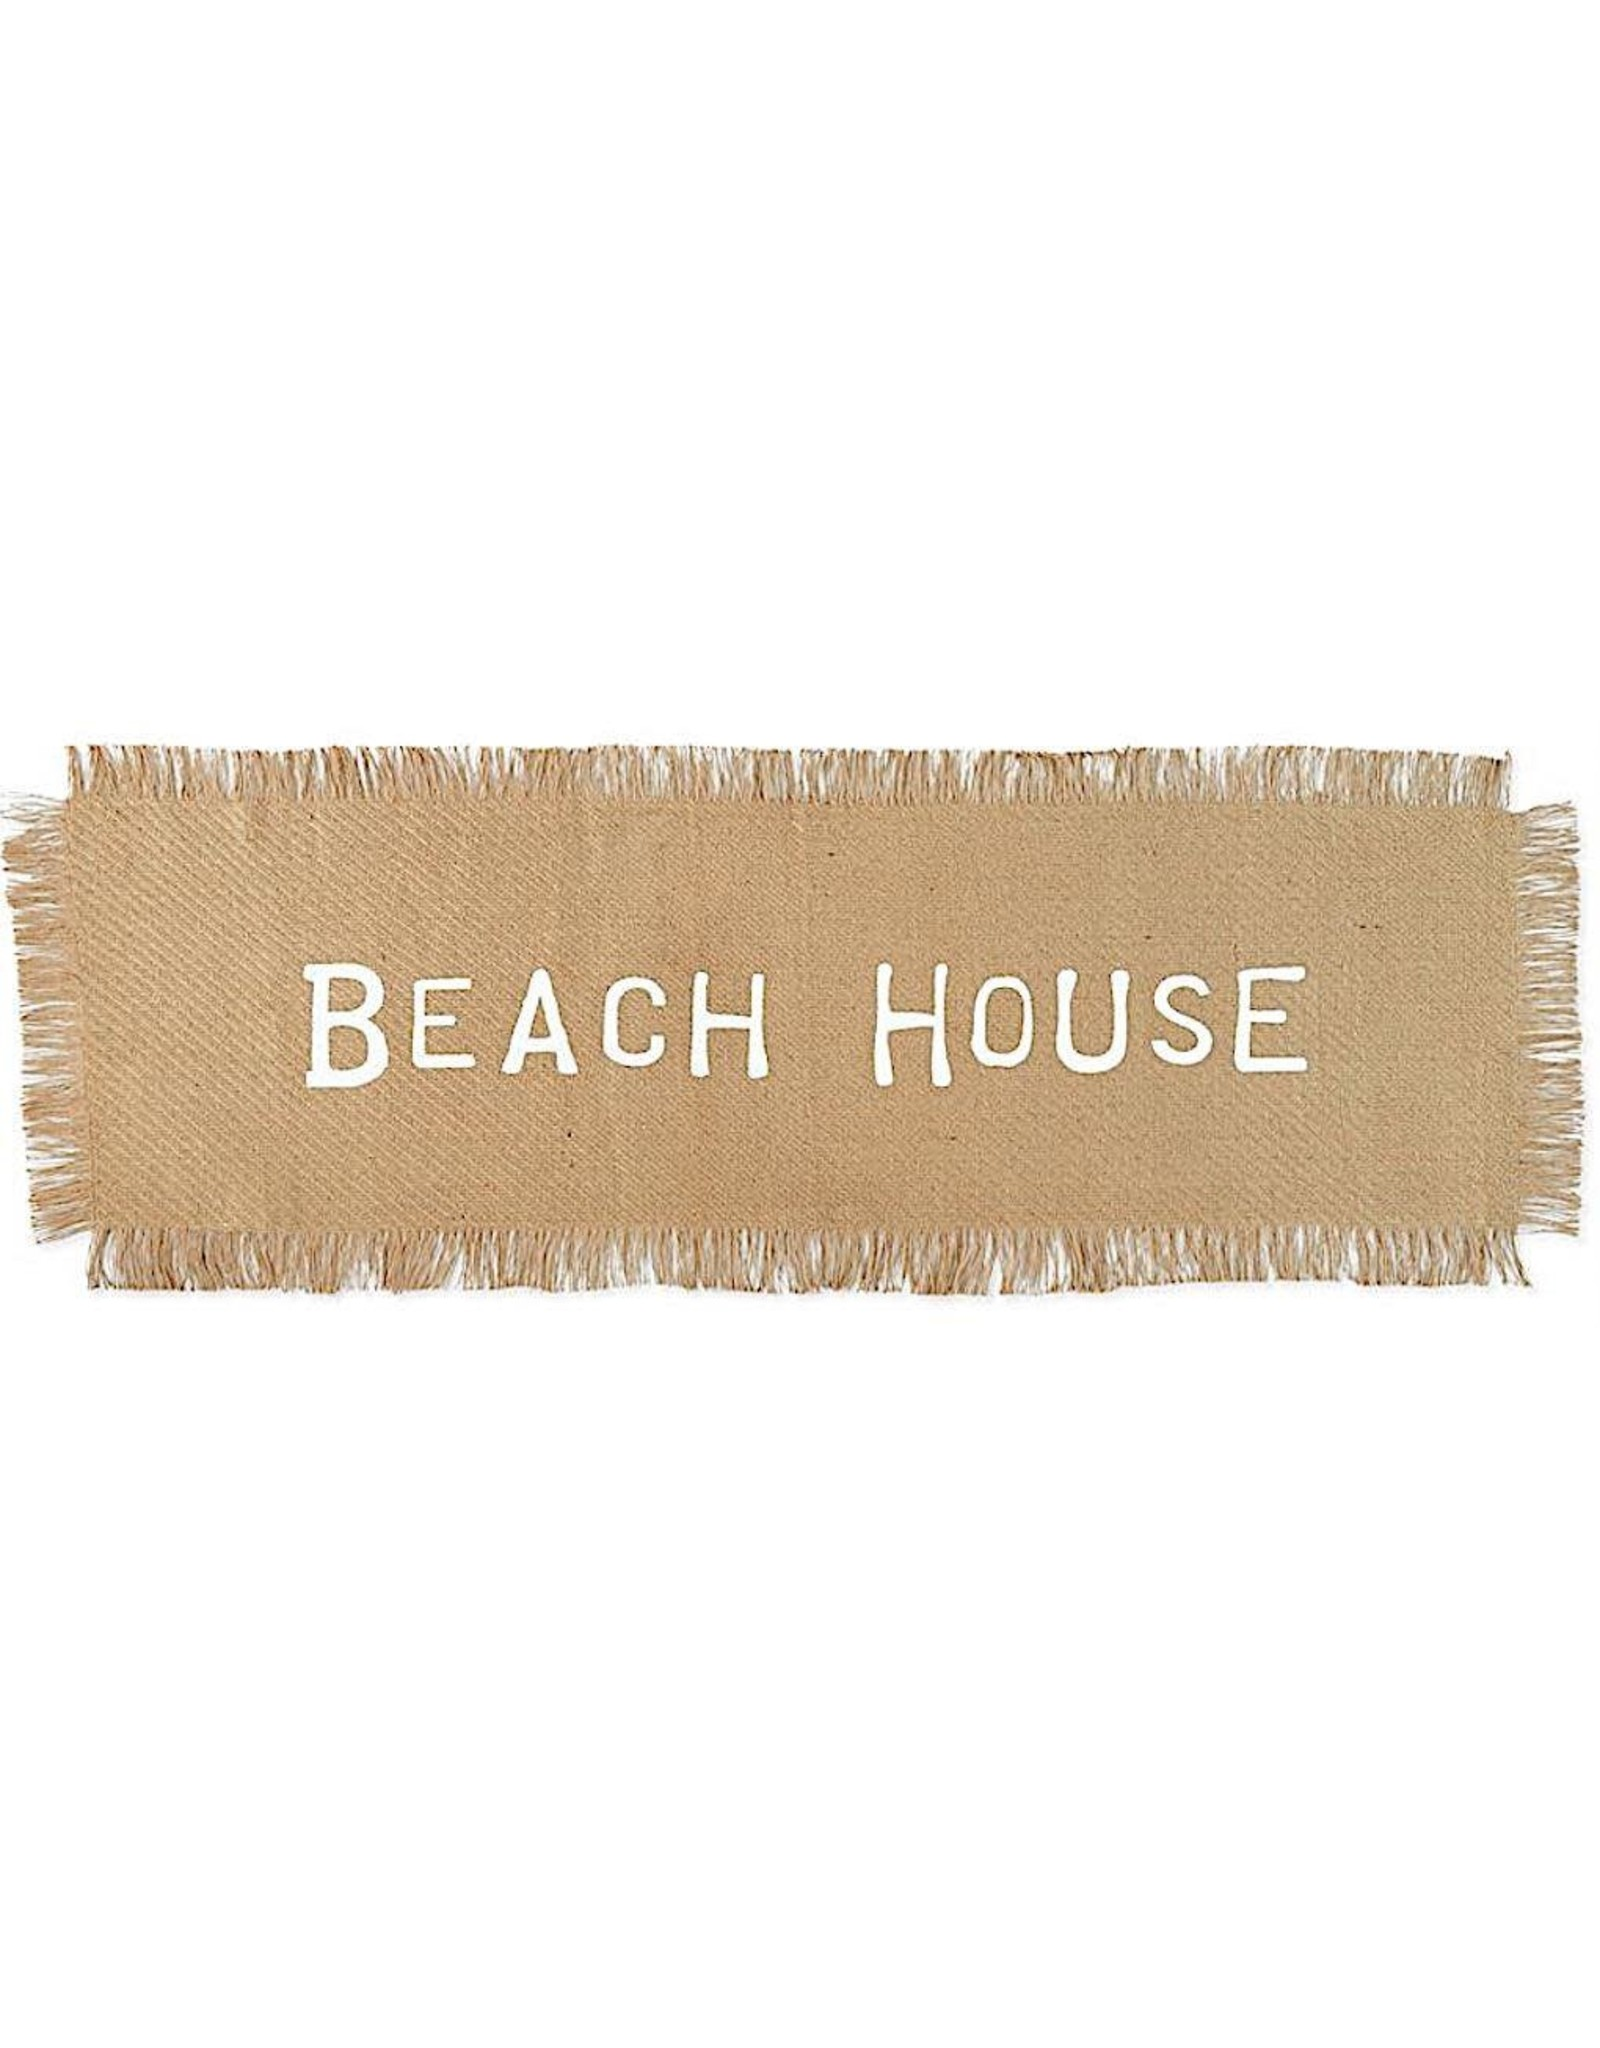 Mud Pie Beach House Just Table Runner 21x72 Inch